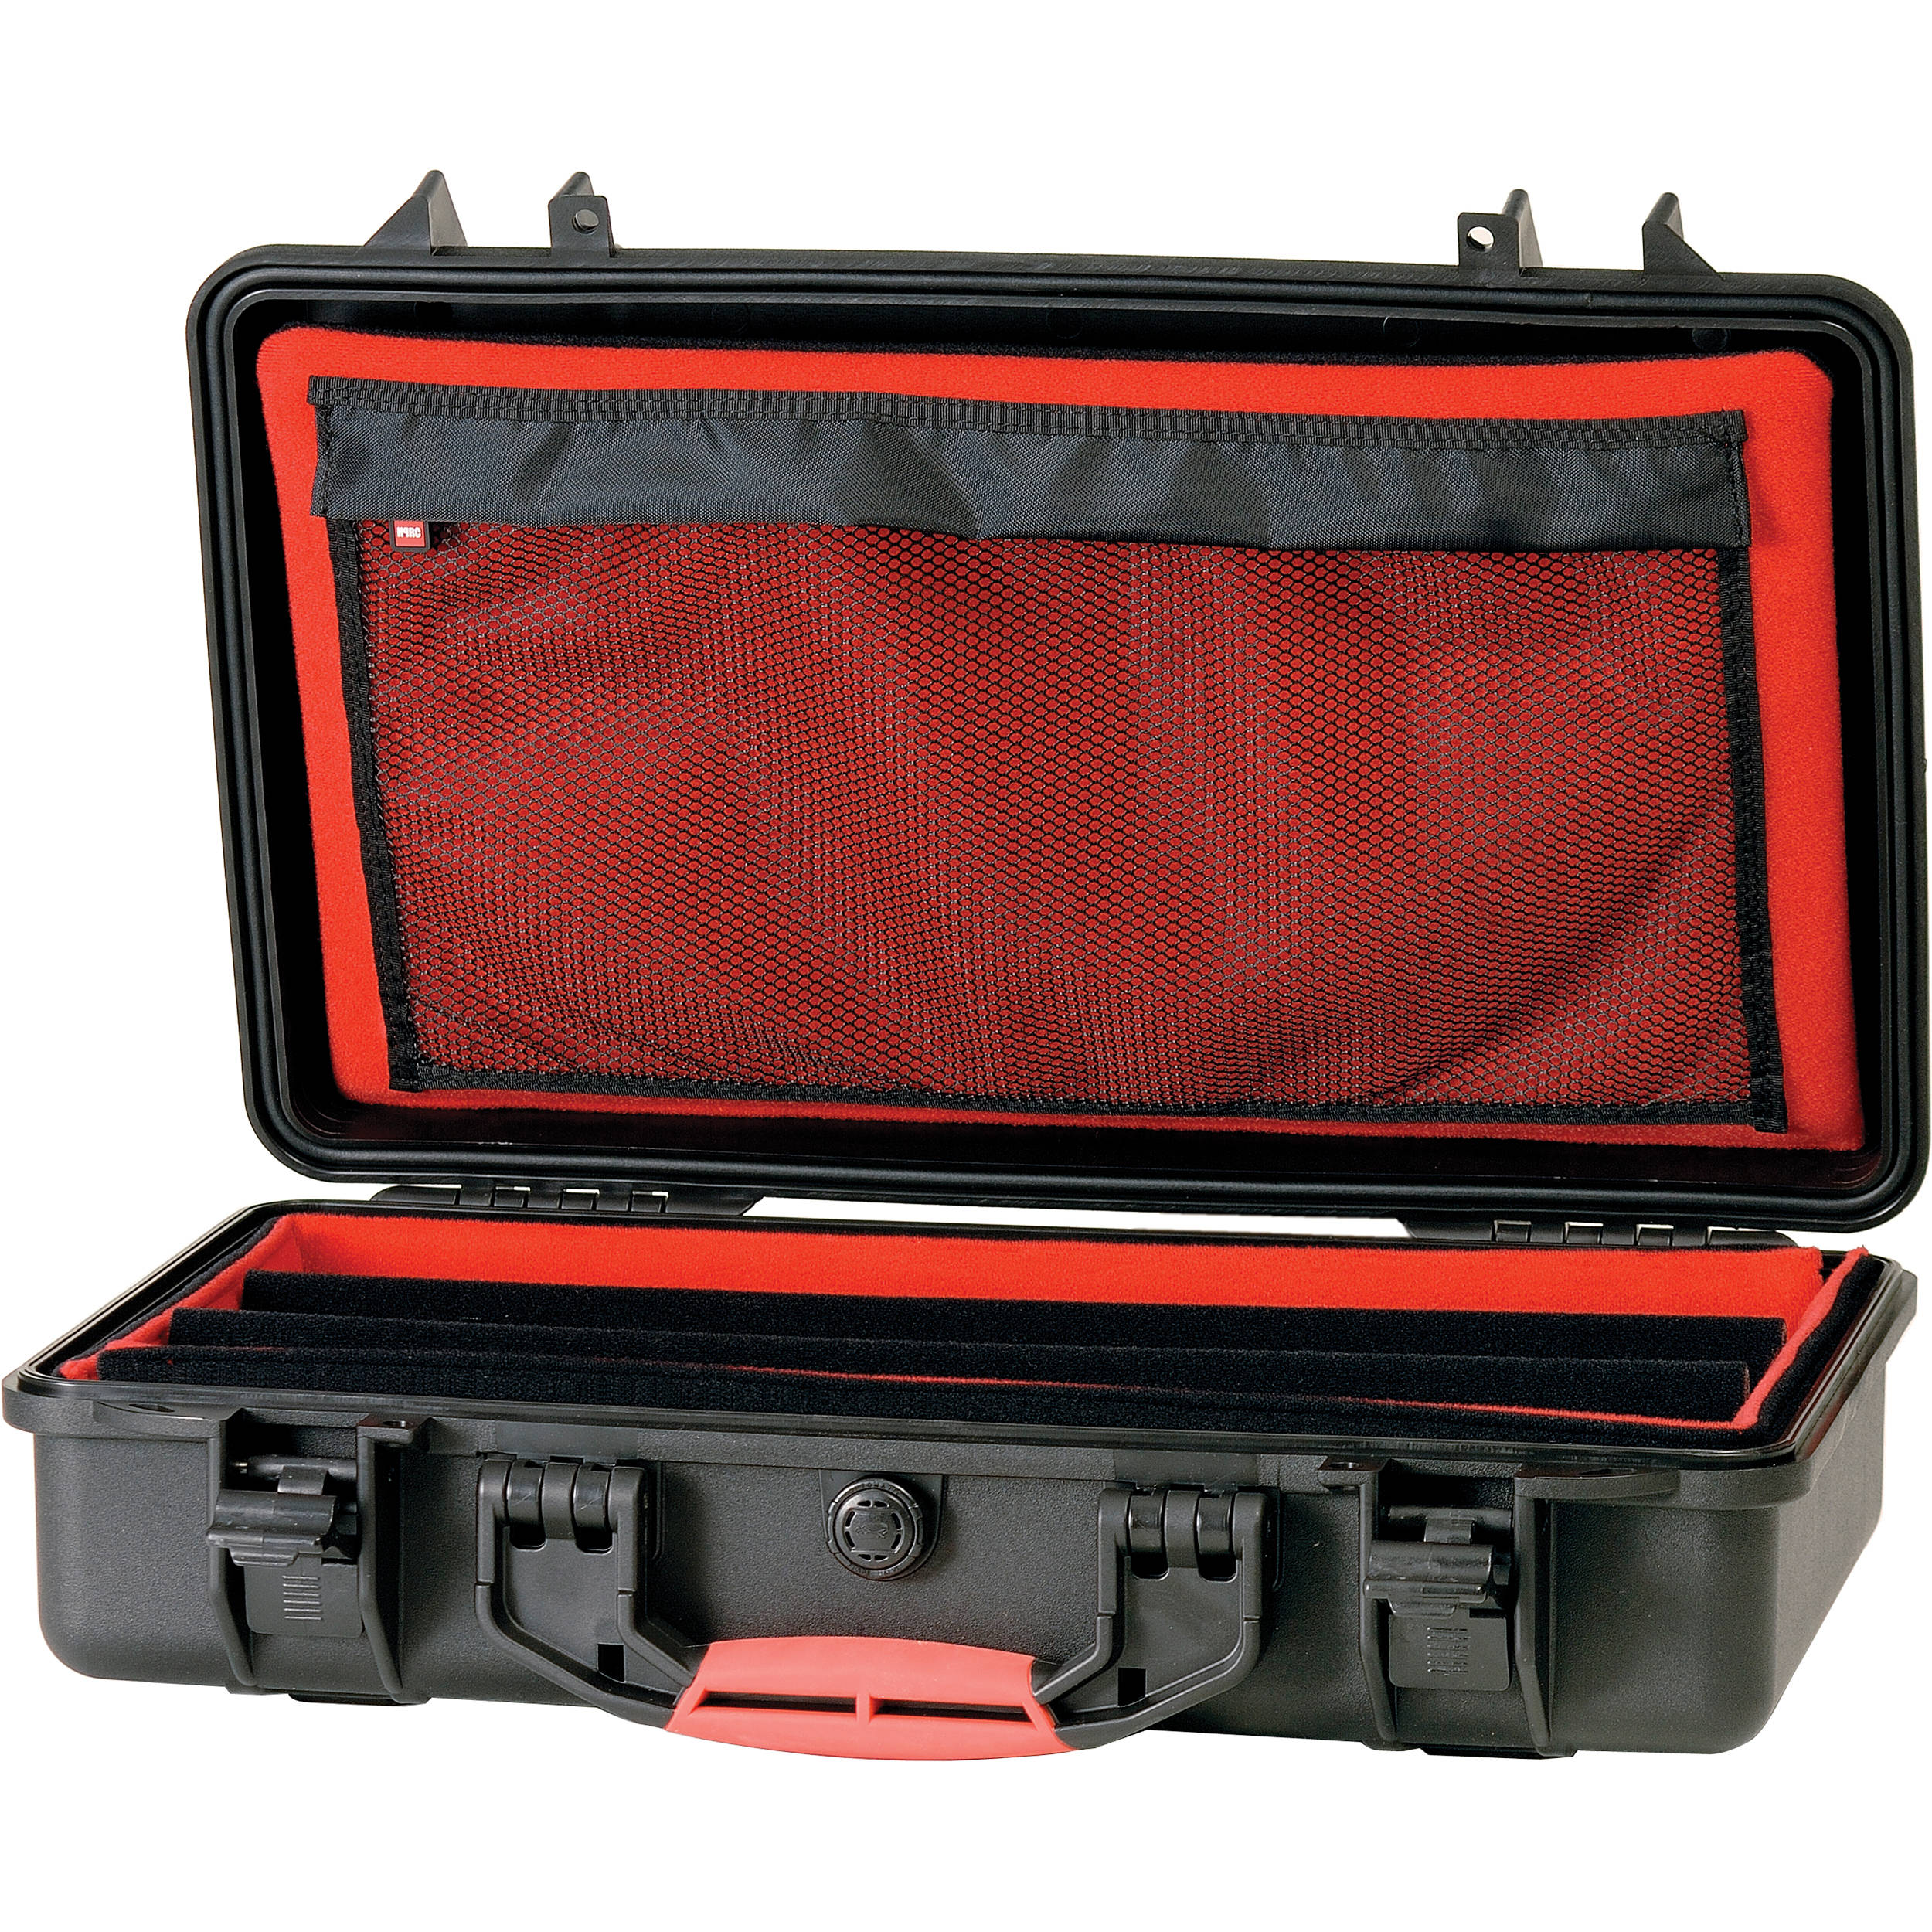 hprc 2530 waterproof hard case with soft padded open hprc2530dk. Black Bedroom Furniture Sets. Home Design Ideas